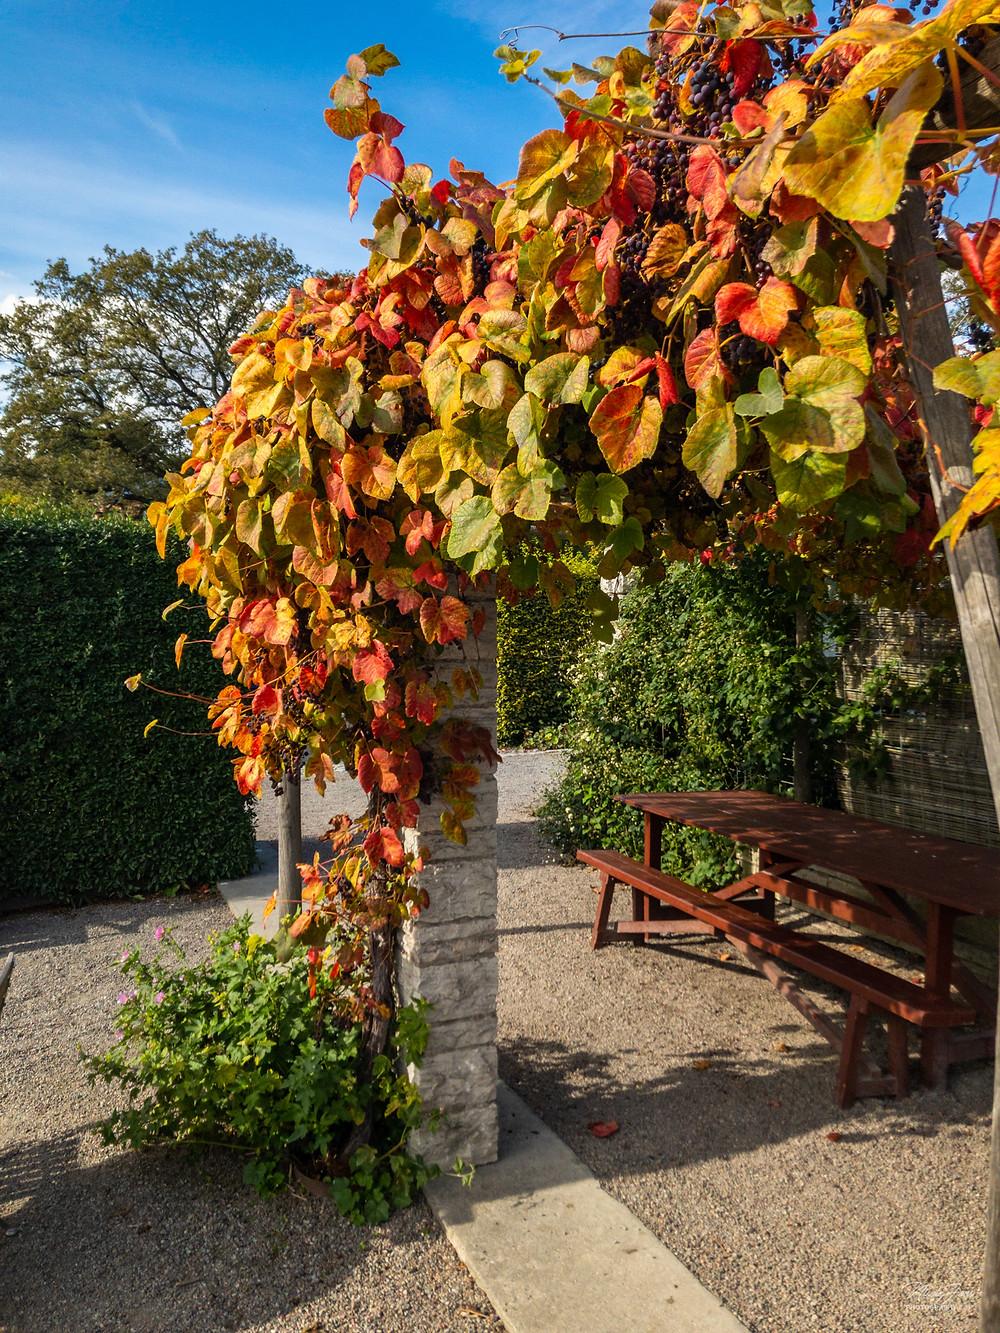 Rosendal's trädgård (Photo: www.NicoleJoosPhotography.com)